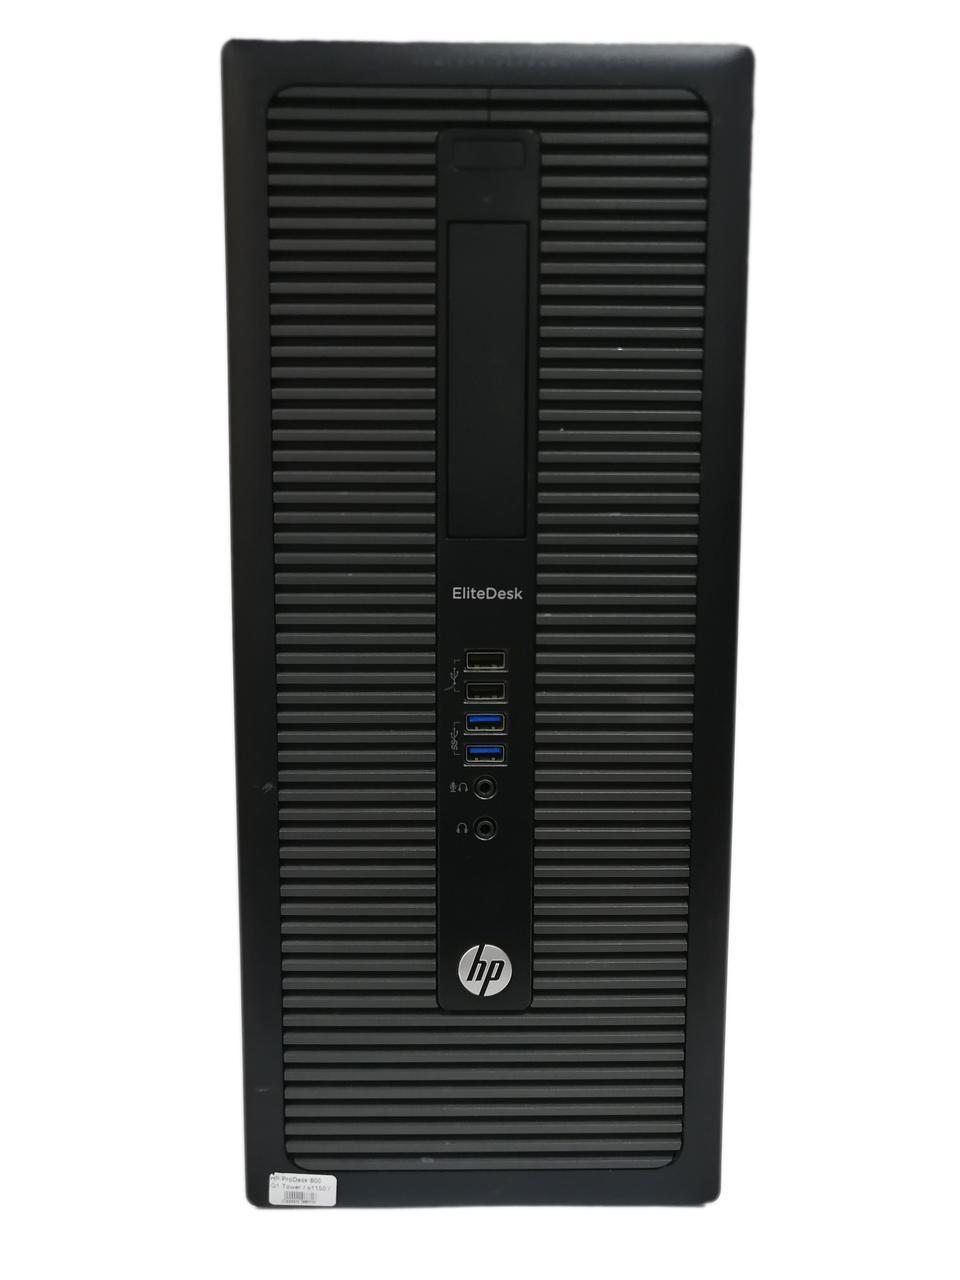 Компьютер HP EliteDesk 800 G1 Tower, Intel Core i3-4150, 8ГБ DDR3, SSD 120ГБ